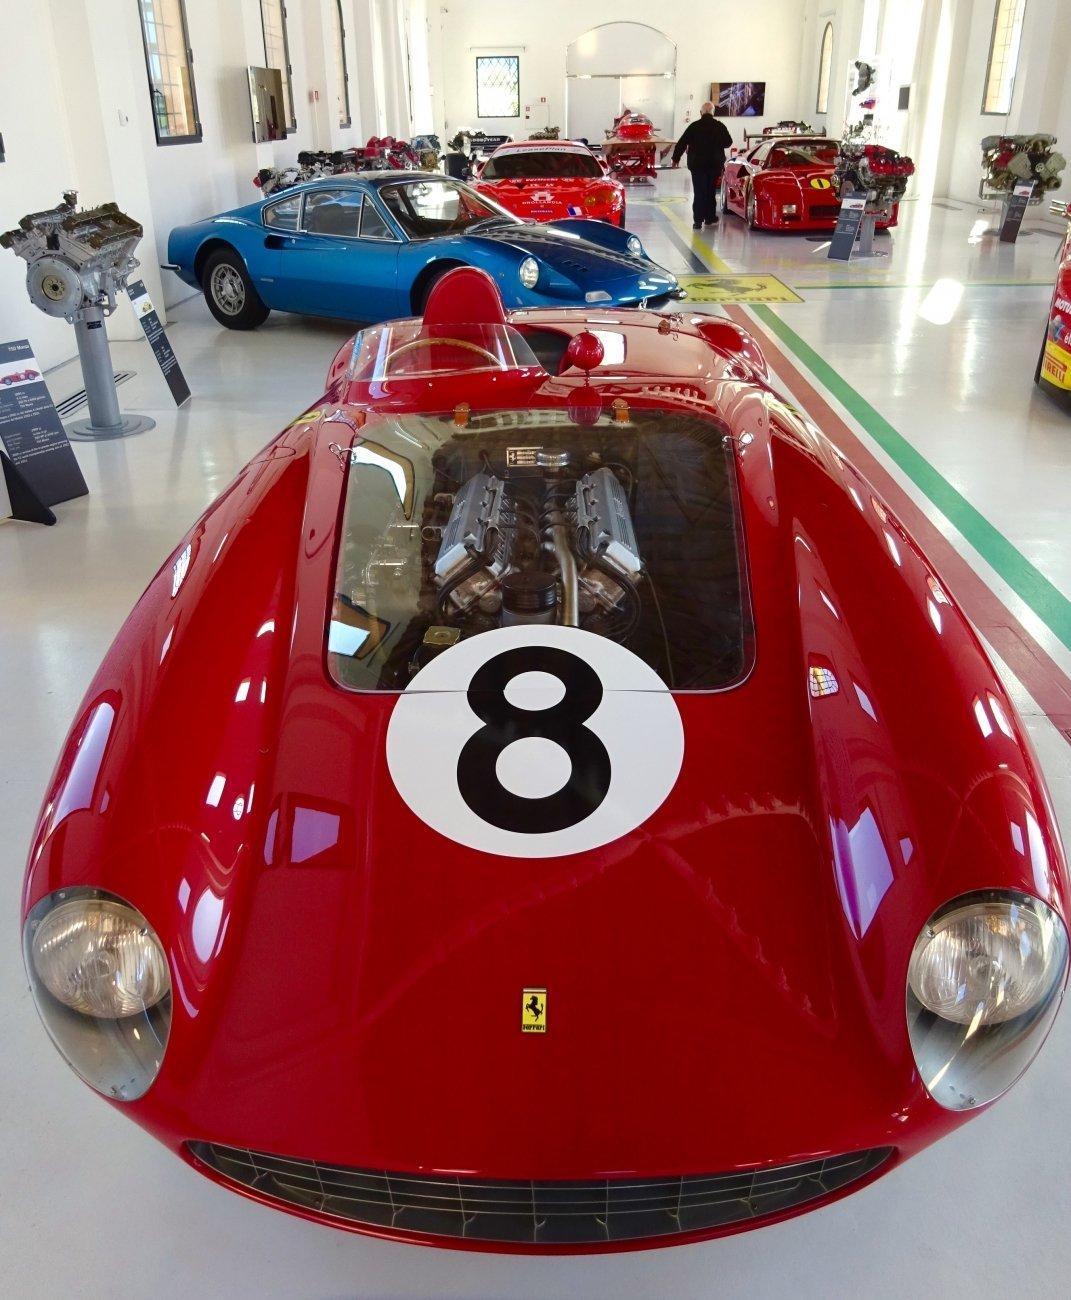 Enzo Ferrari Museum in Modena Italy